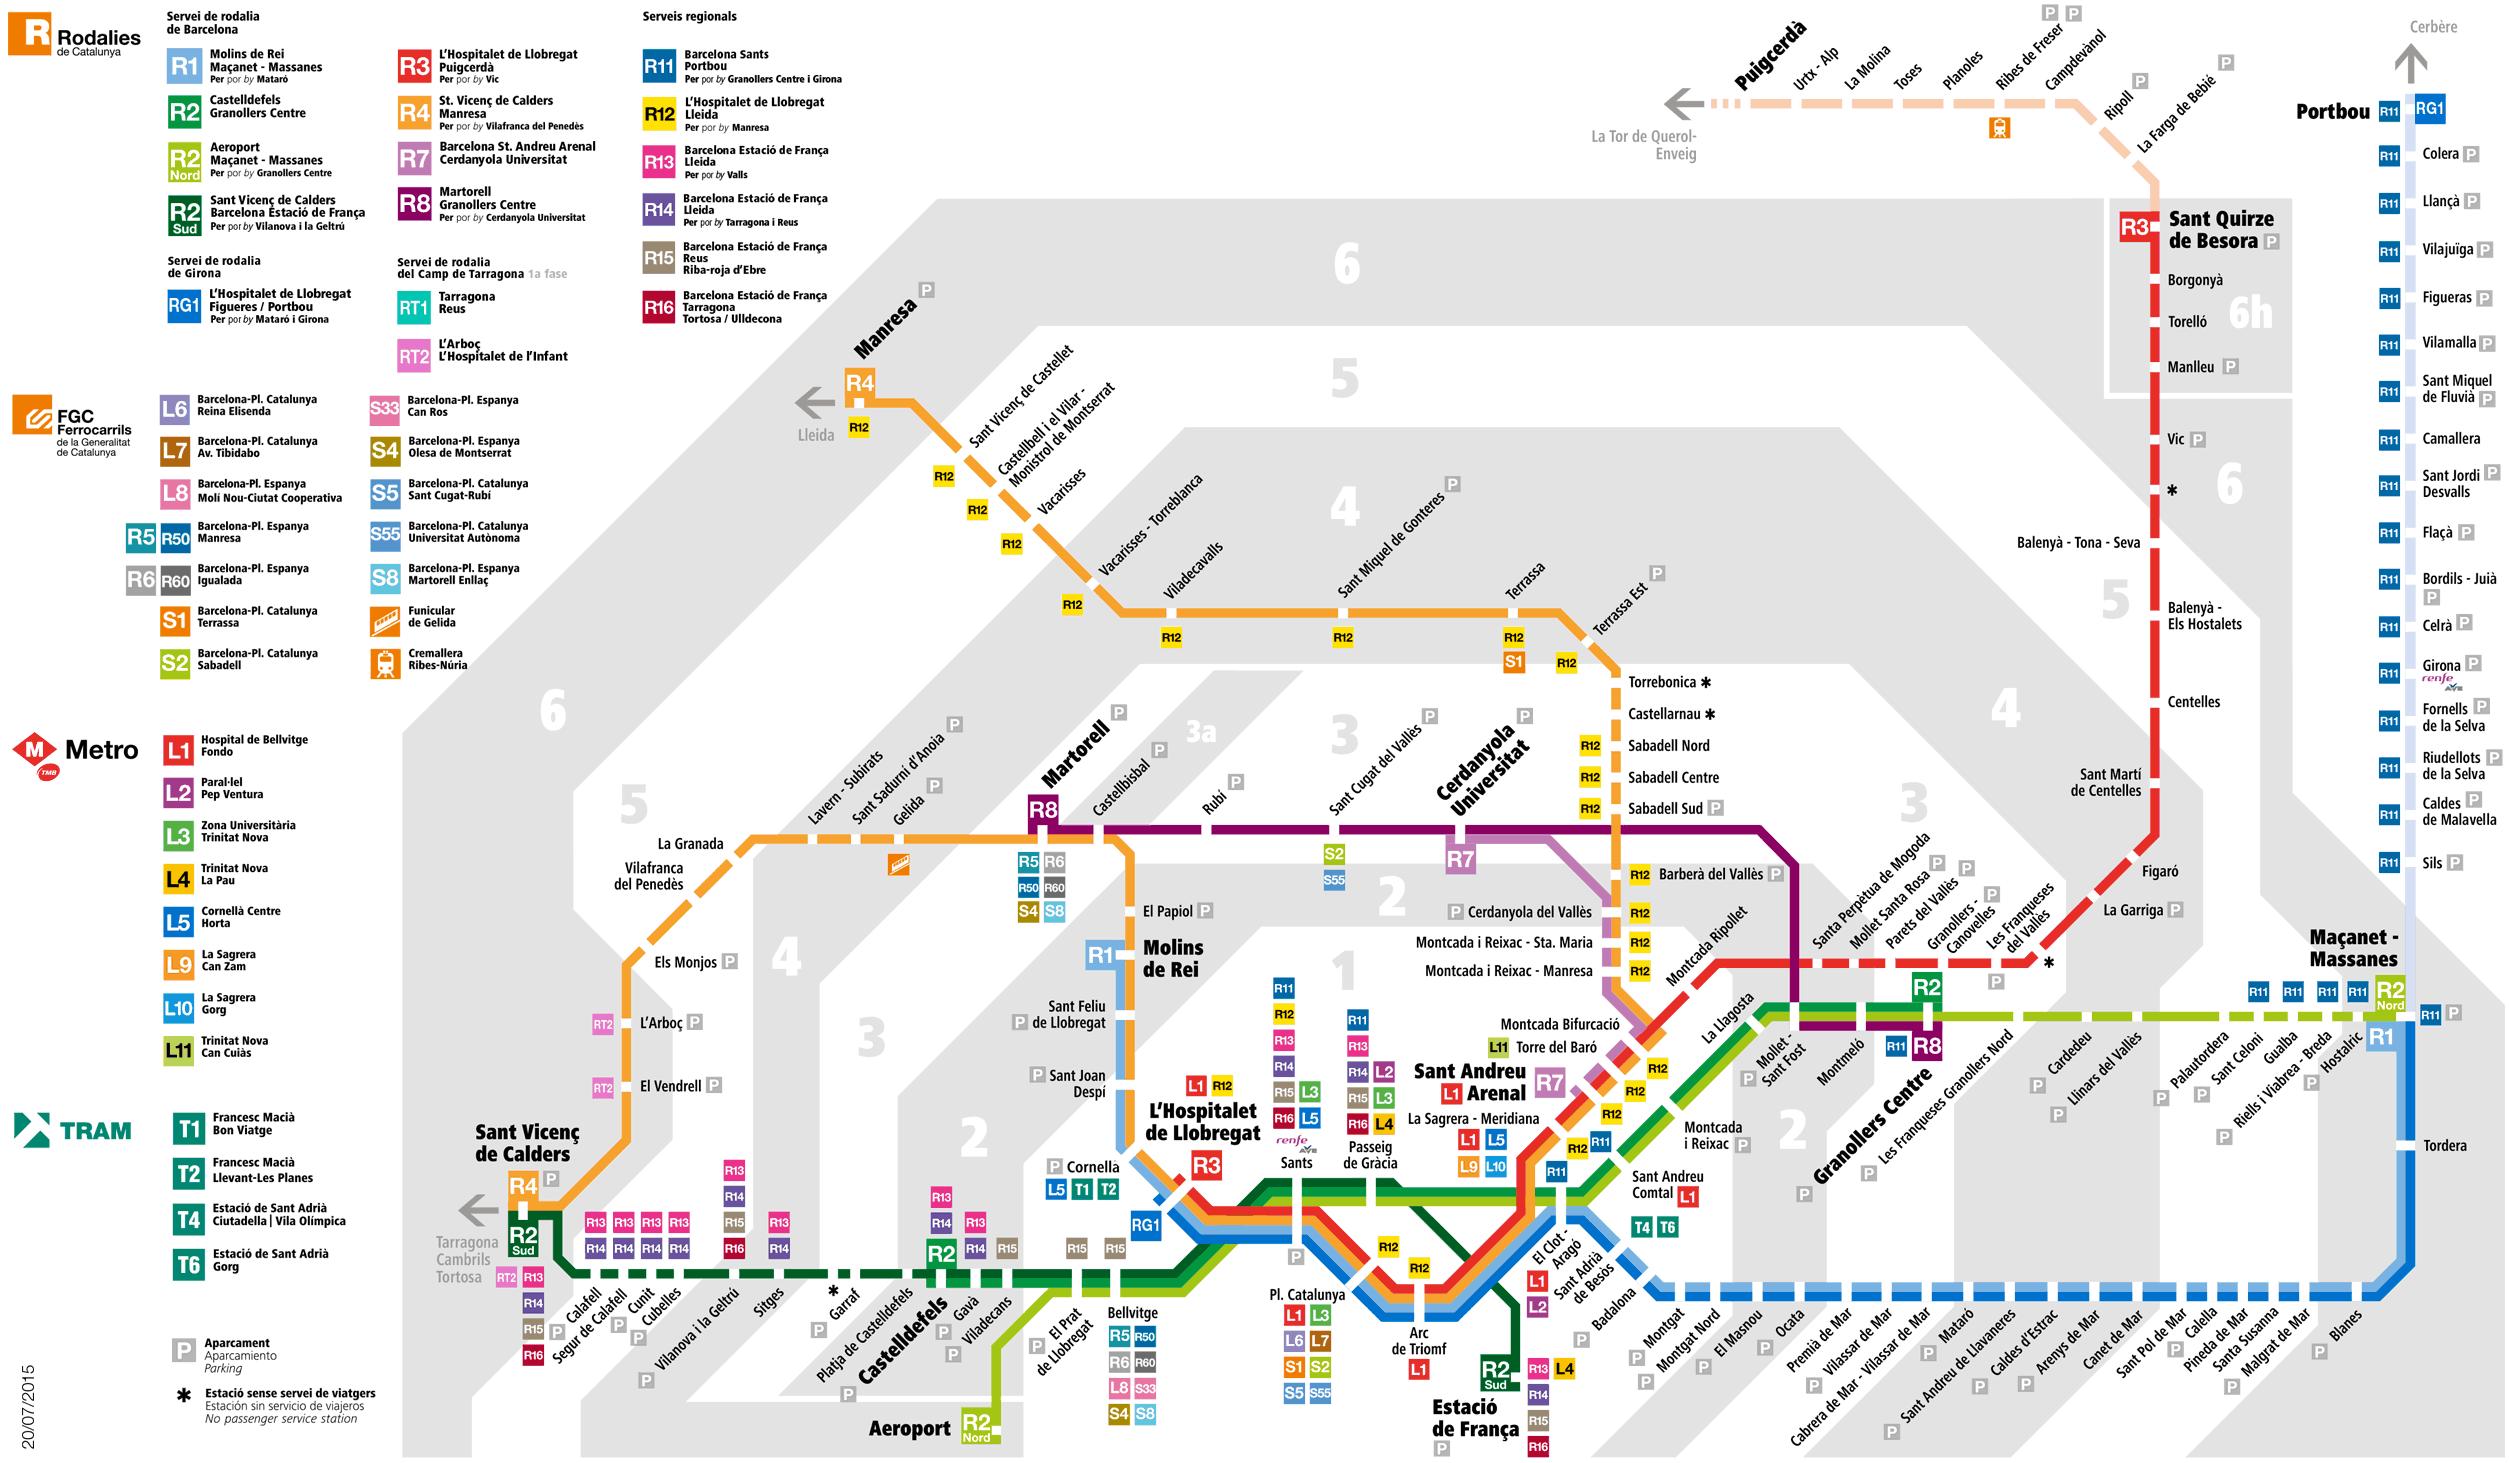 Mapa Renfe Regional Catalunya.Mapa Renfe Catalunya Mapa